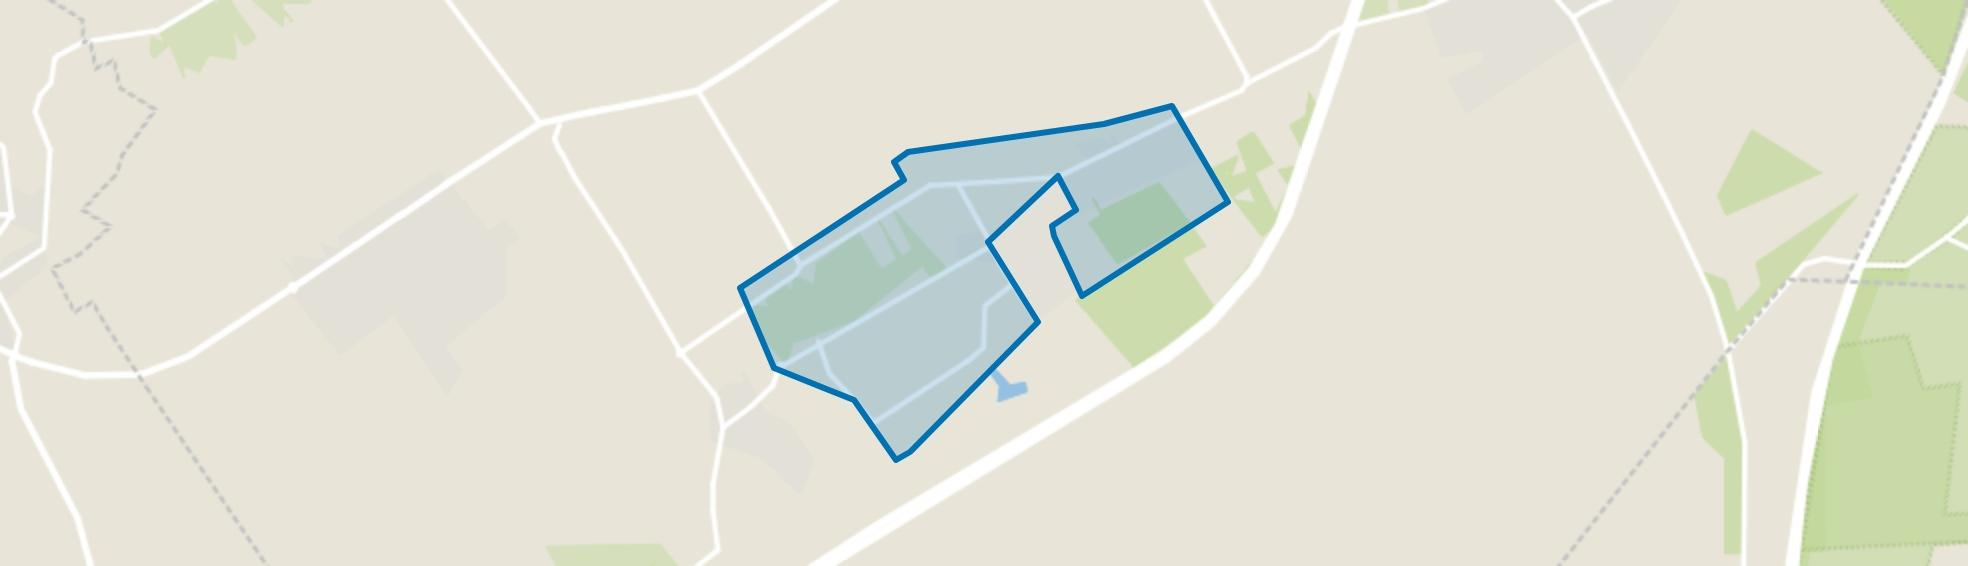 Verspreide huizen 't Loo, 't Loo Oldebroek map